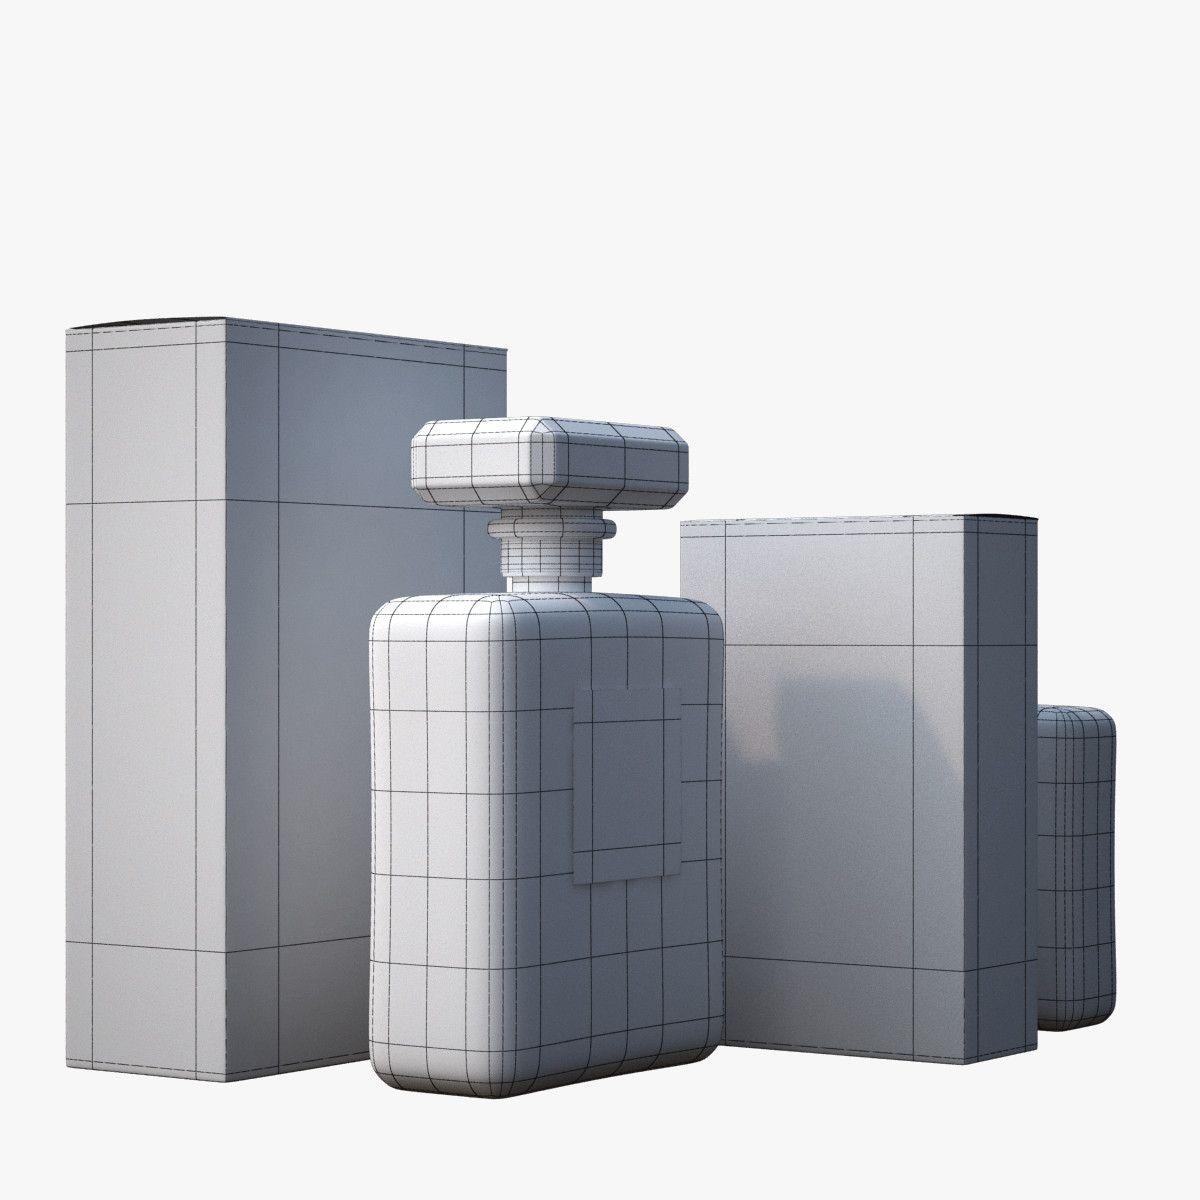 3d model - chanel n°5 perfume bottles | REMEMBER THESE